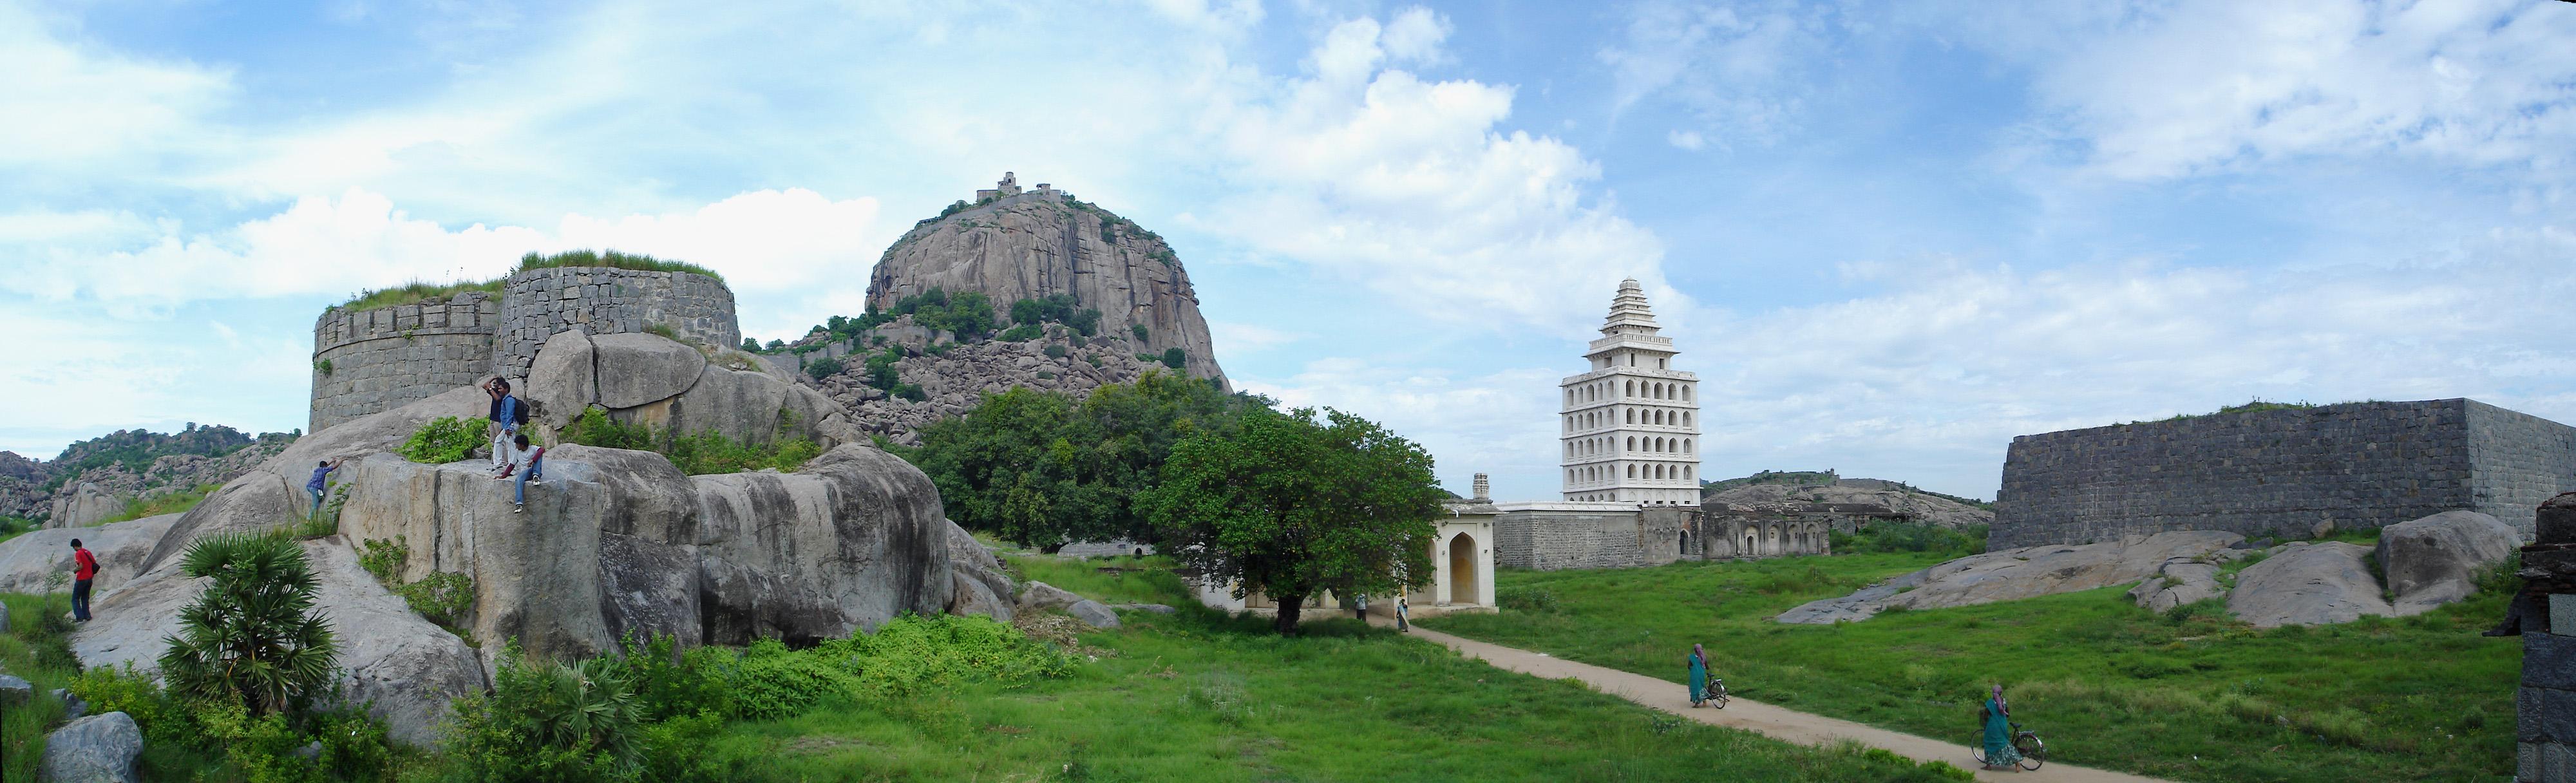 https://i1.wp.com/upload.wikimedia.org/wikipedia/commons/6/69/Gingee_Fort_panorama.jpg